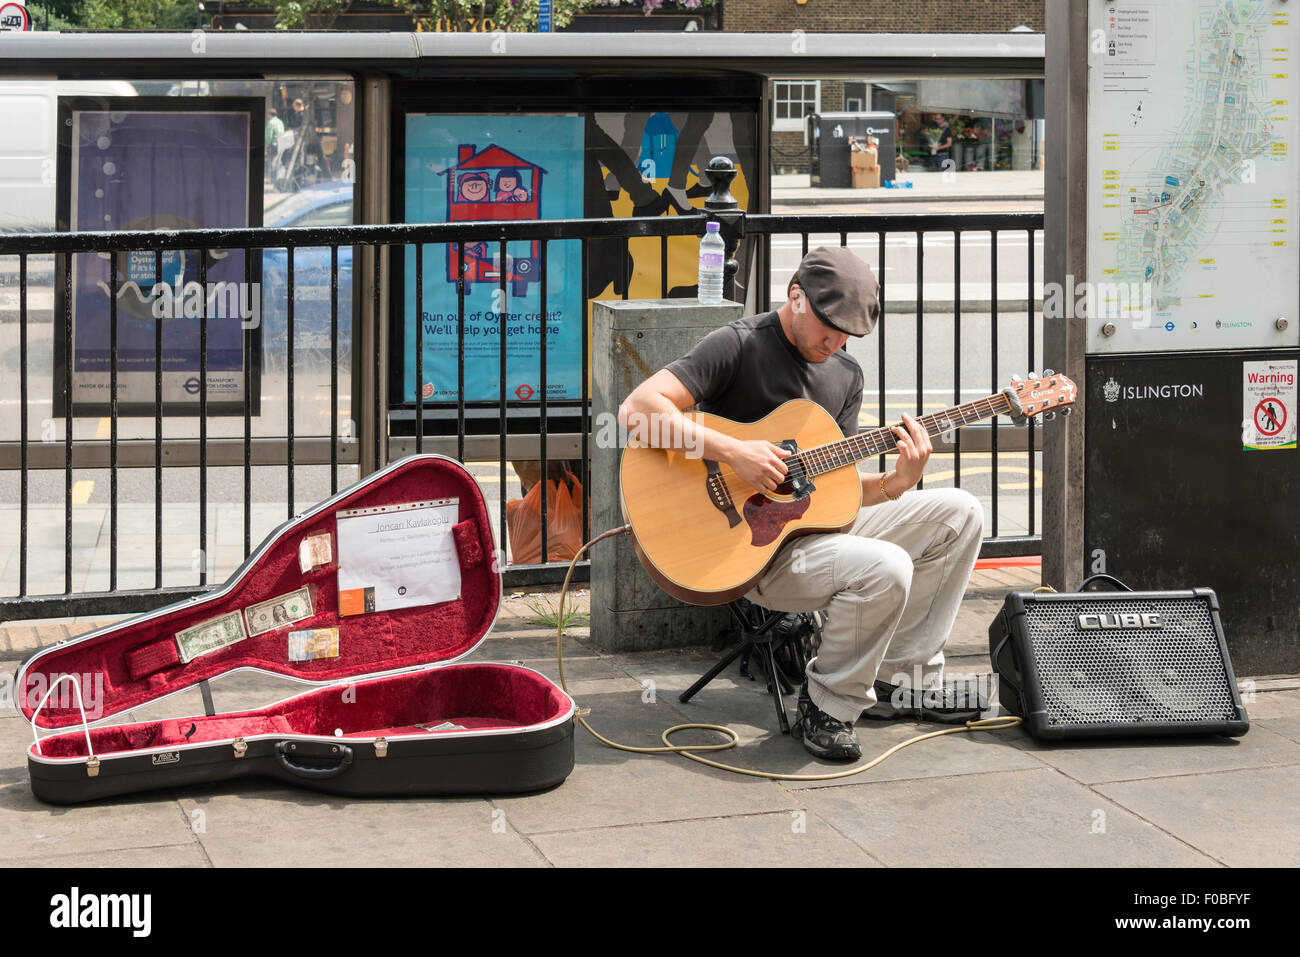 Street busker playing guitar, Islington High Street, Islington, London Borough of Islington, London, England, United - Stock Image